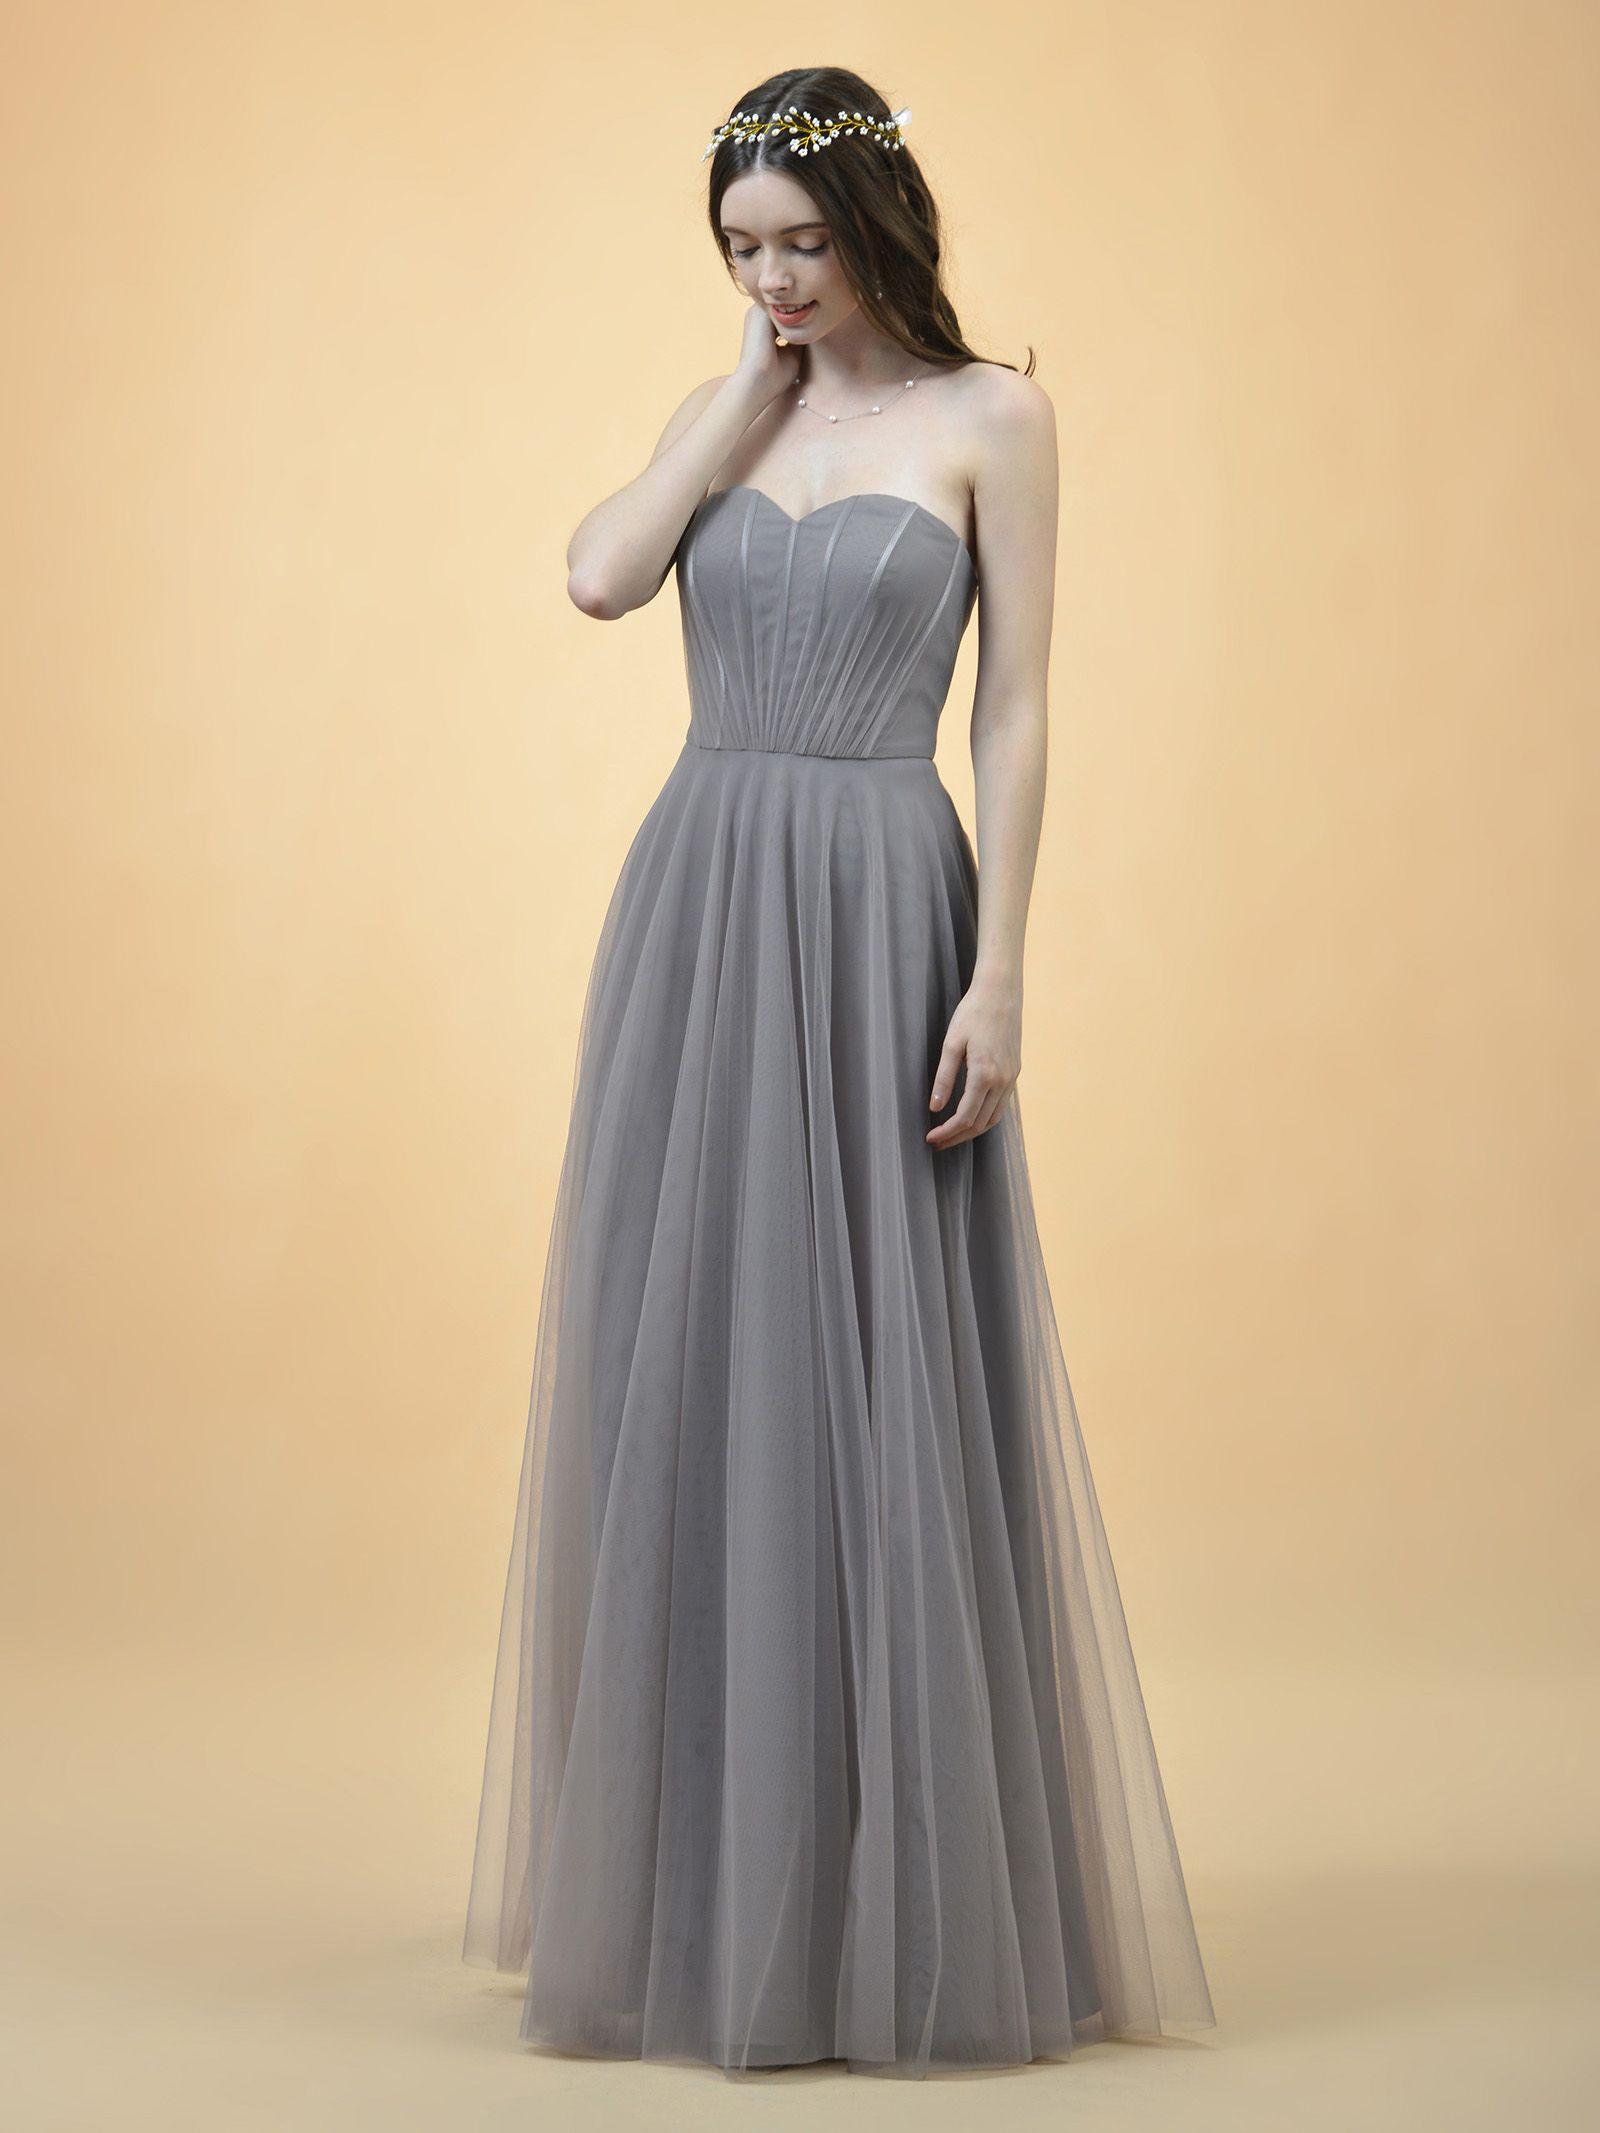 0596b756b32 Ernestine Sweetheart Strapless Bridesmaid Dress  121.00 - AW.Bridal ...